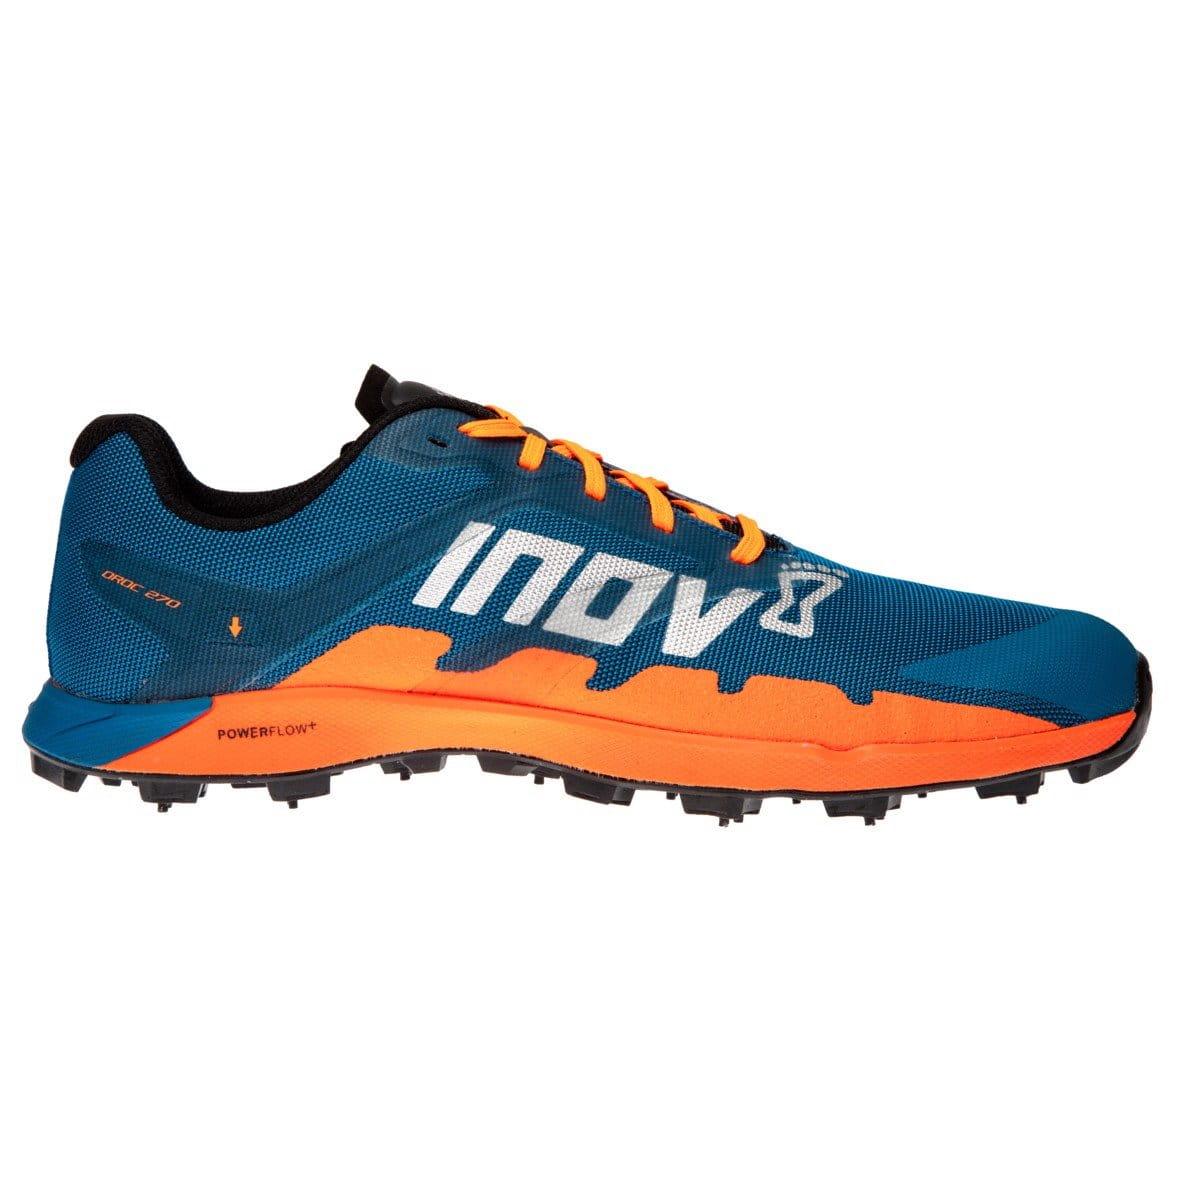 Běžecká obuv Inov-8  OROC 270 M (P) blue/orange modrá/oranžová